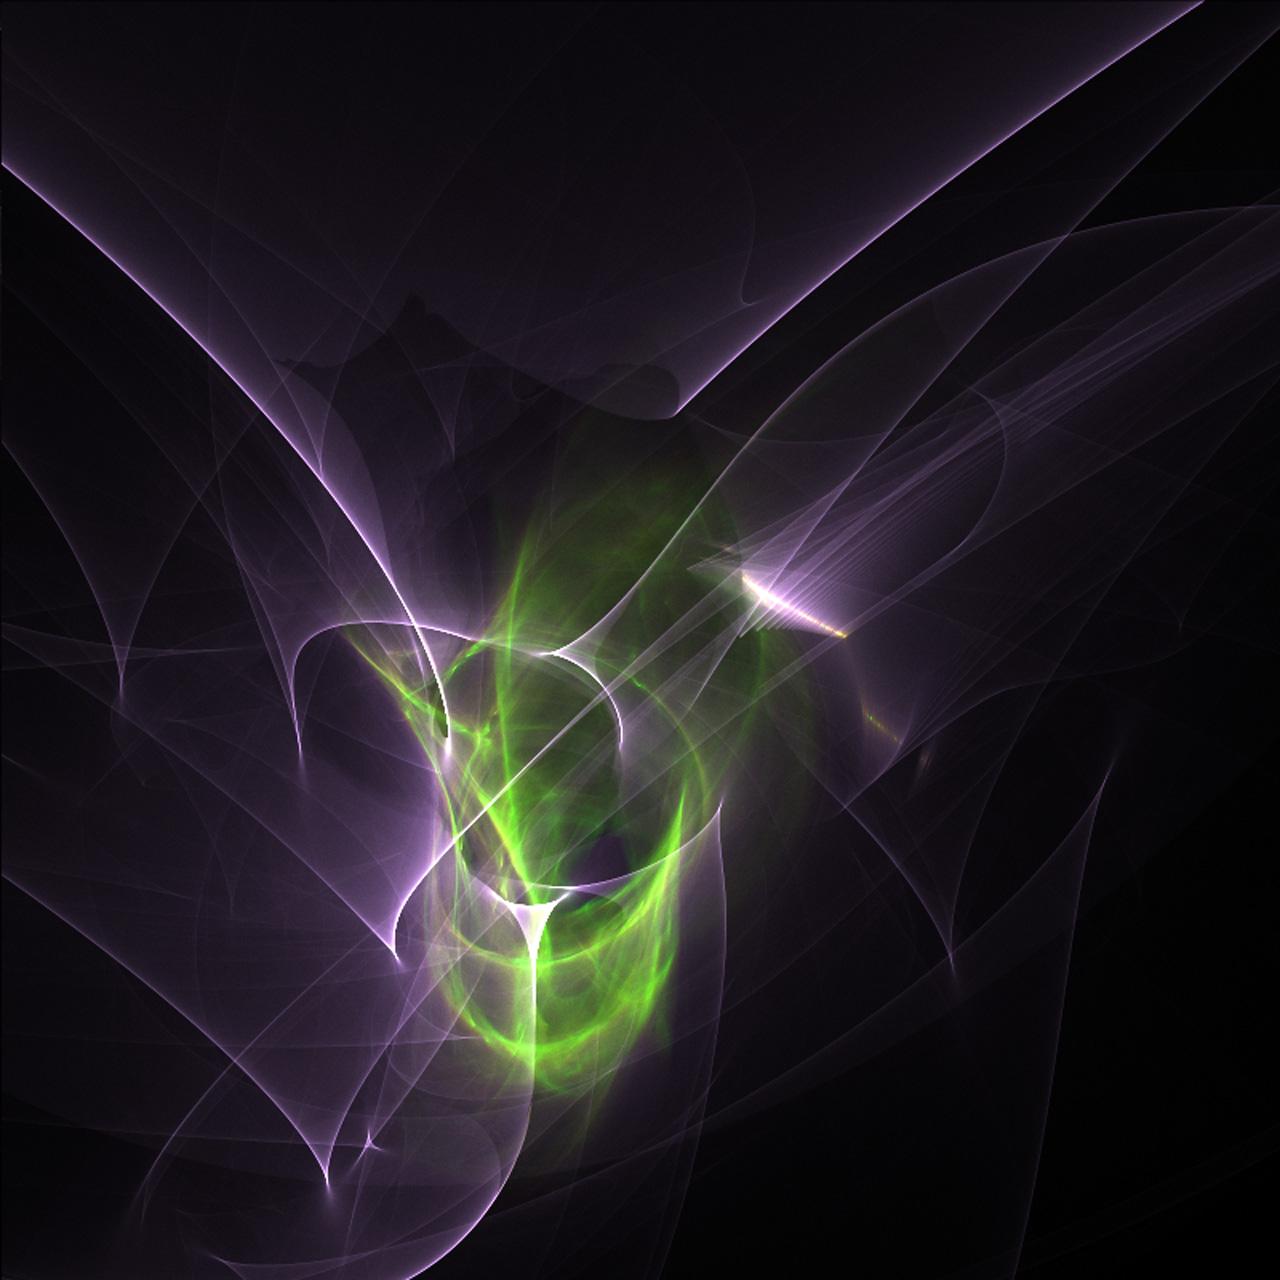 software_buddhabrot_image37